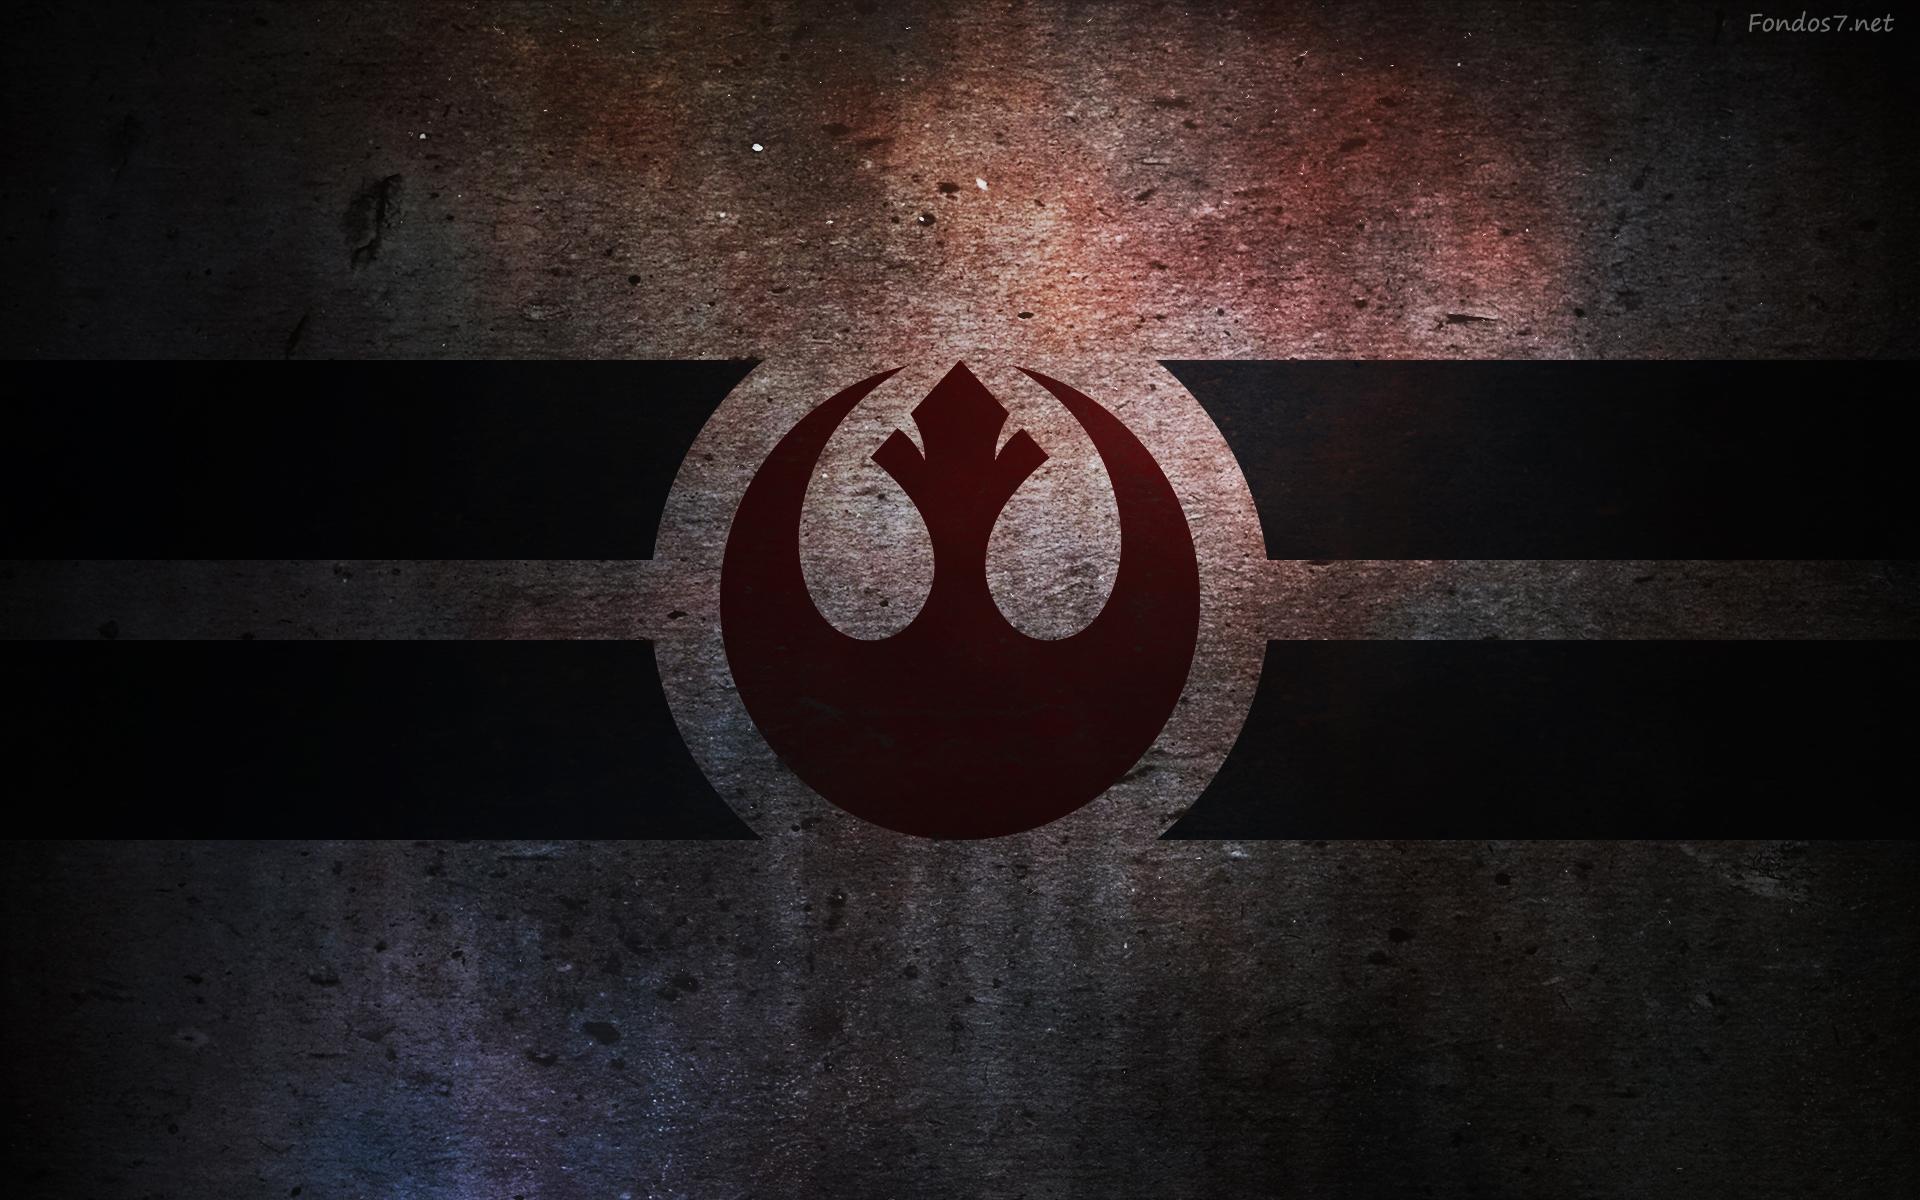 Fondos de pantalla star wars logo hd widescreen Gratis imagenes 1859 1920x1200